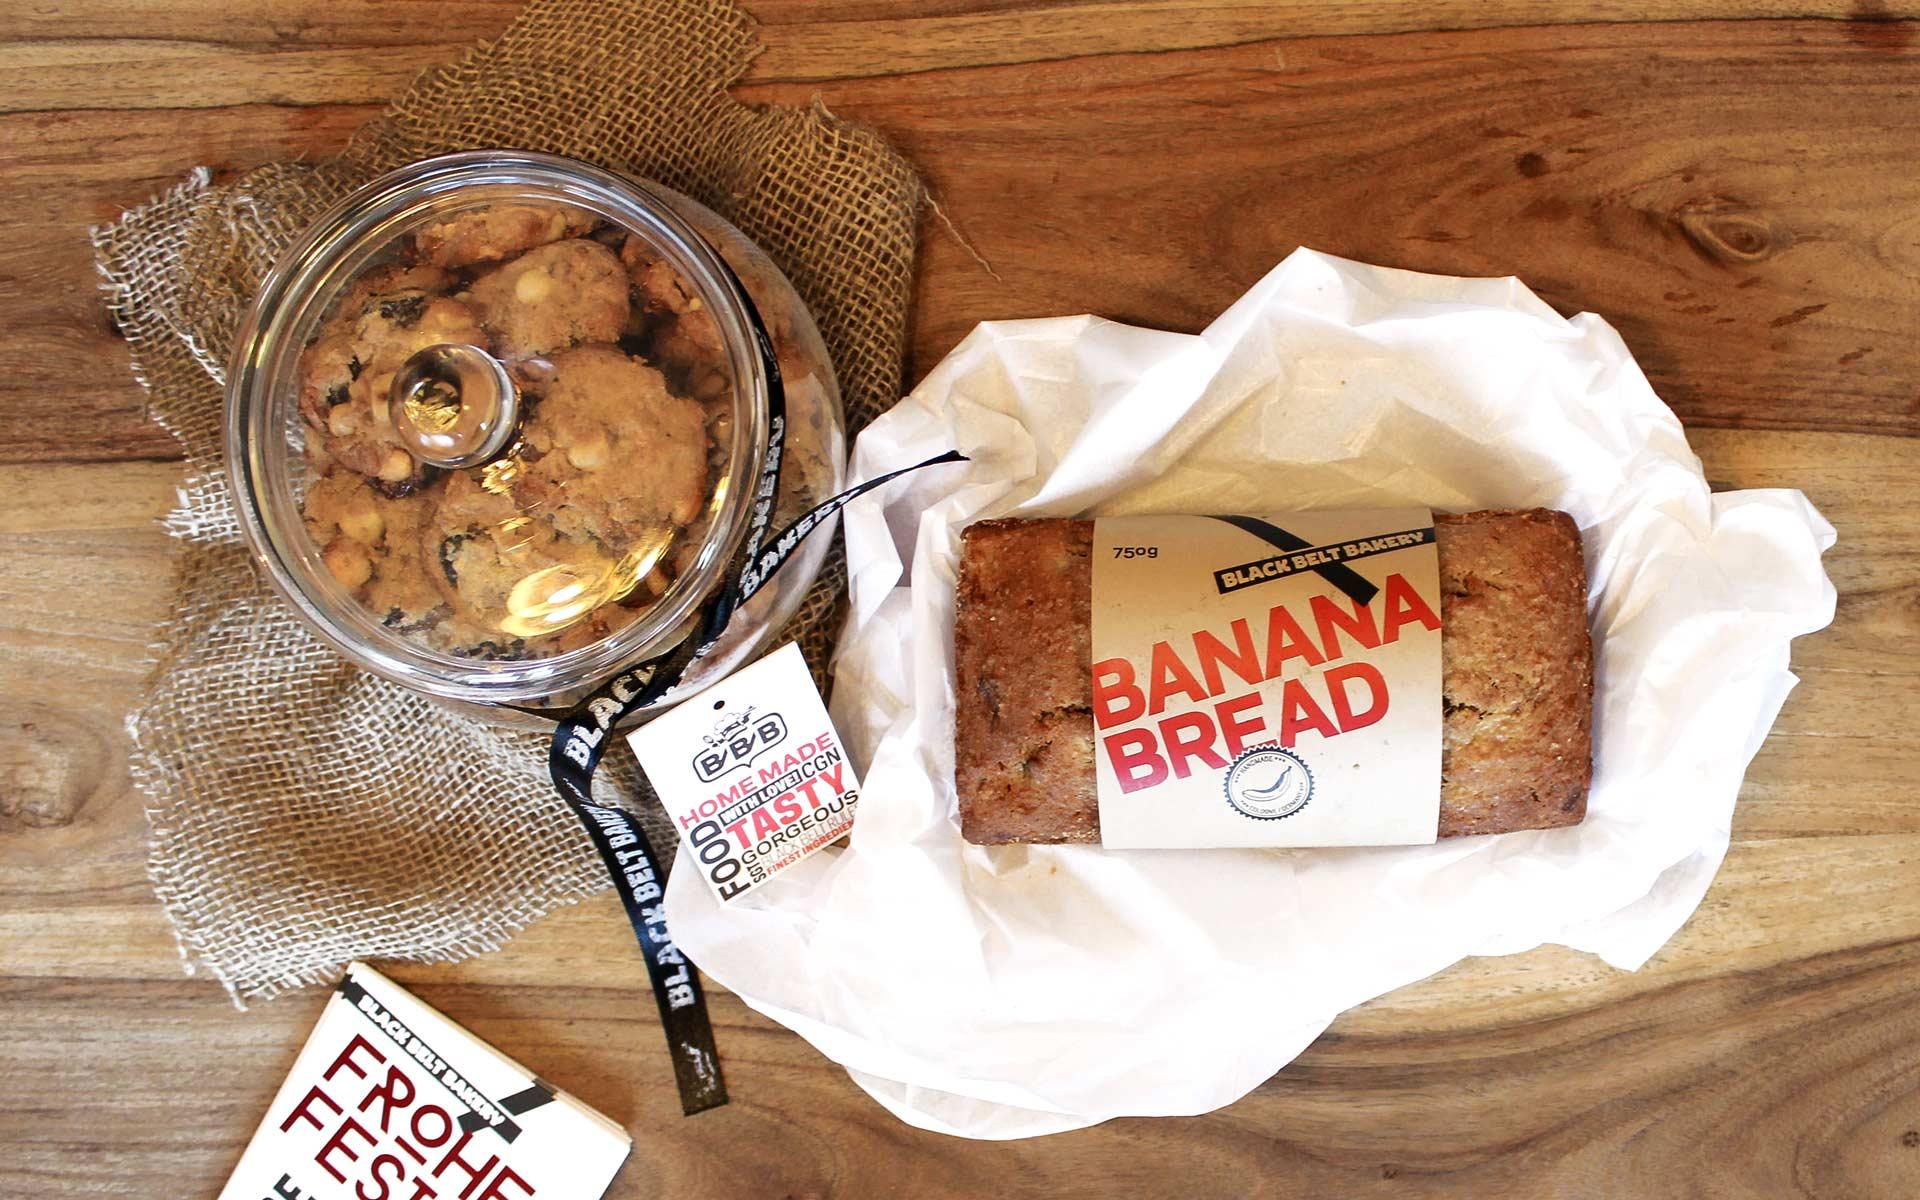 Black Belt Bakery Corporate Design, Verpackung, Bananenbrot und Cookies